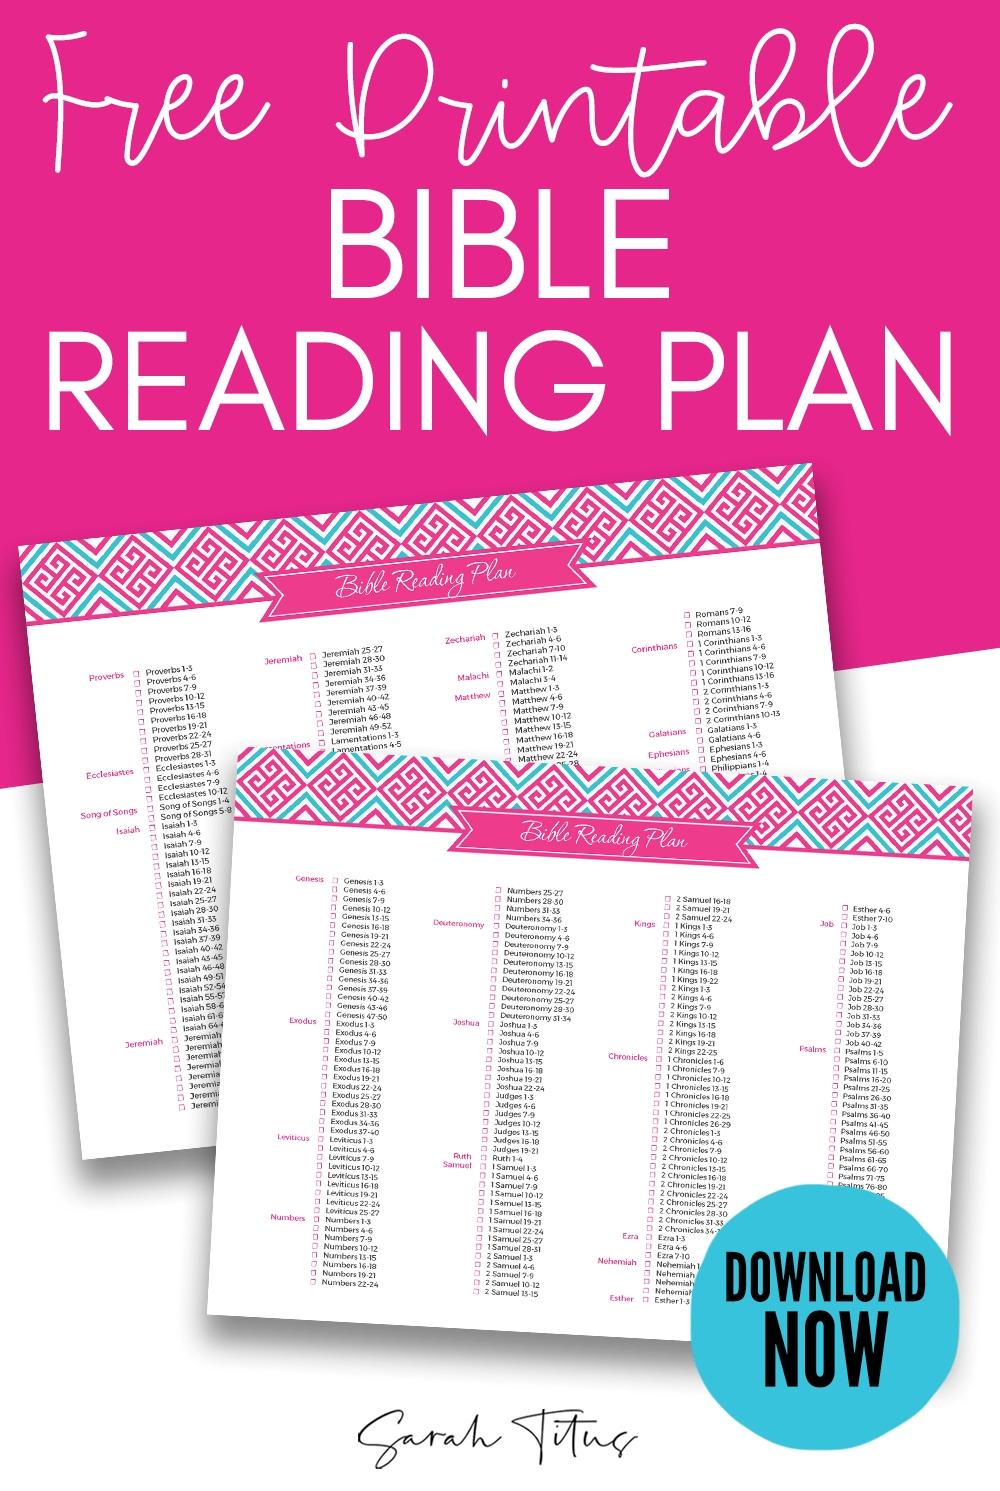 Free 2020 Bible Reading Schedule | Get Free Calendar regarding Sarah Titus Printables